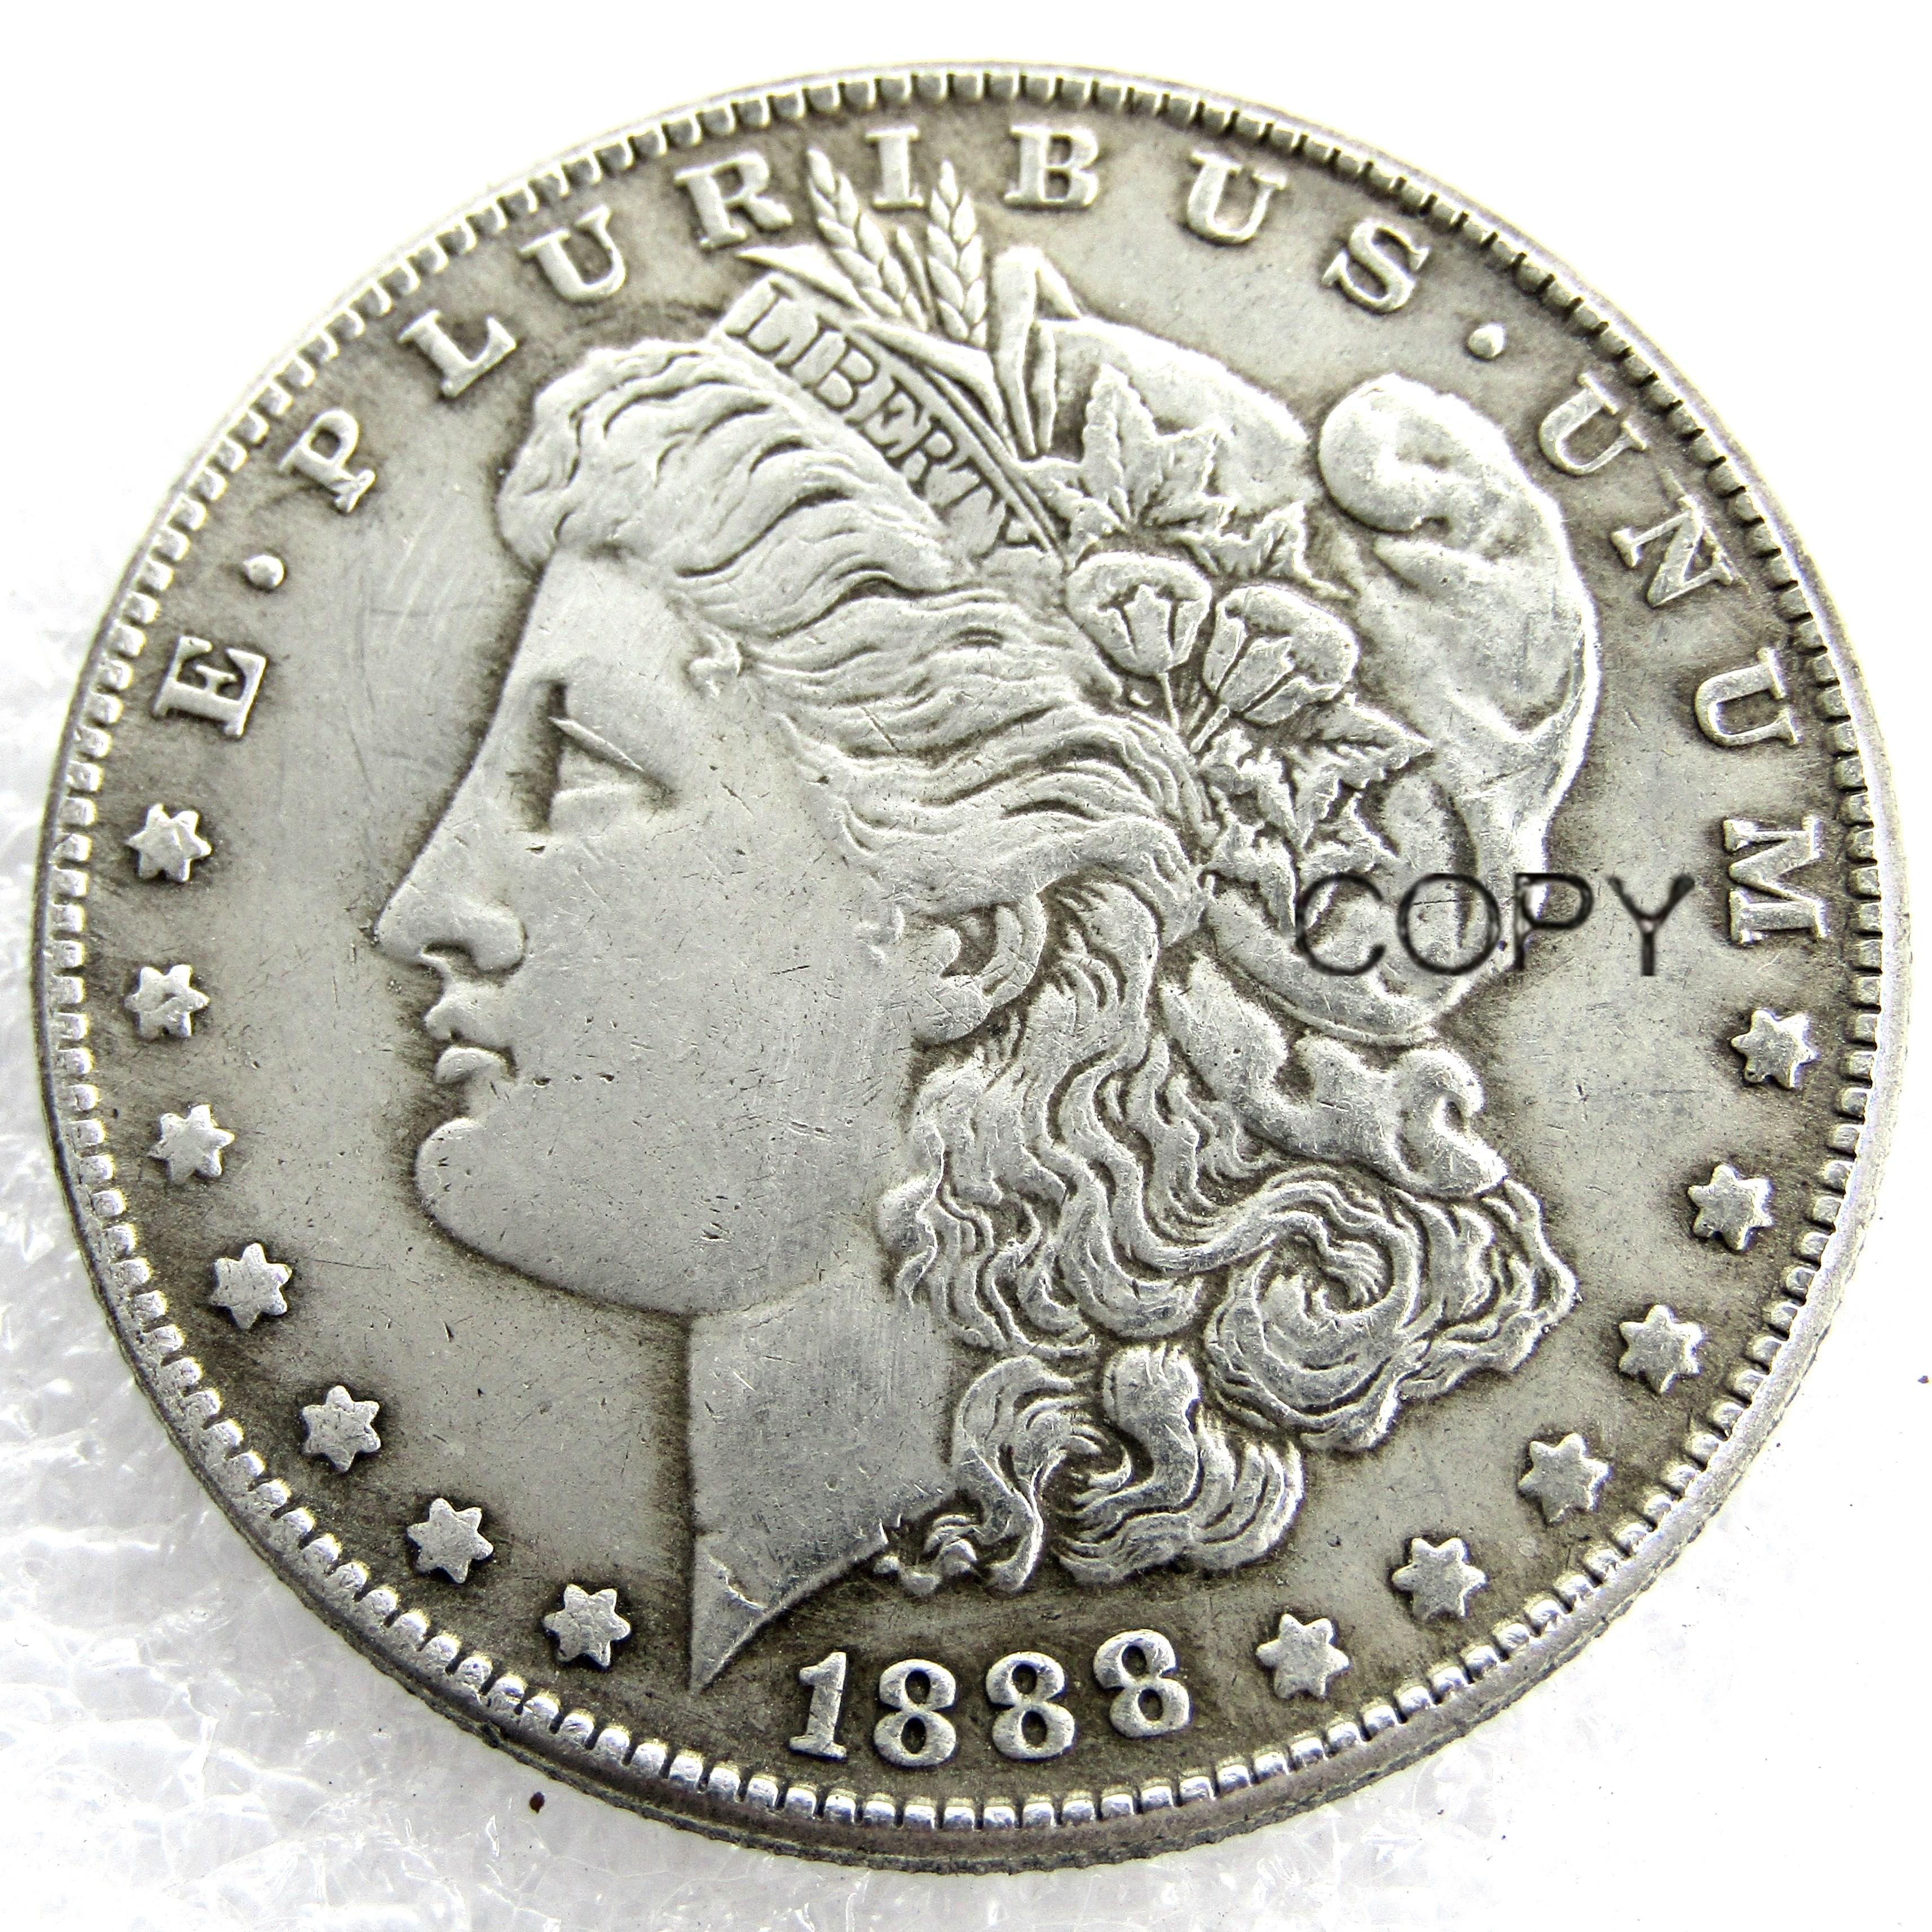 US Coins 1888 P/S/O Morgan Dollar copy Coins Silver Plated